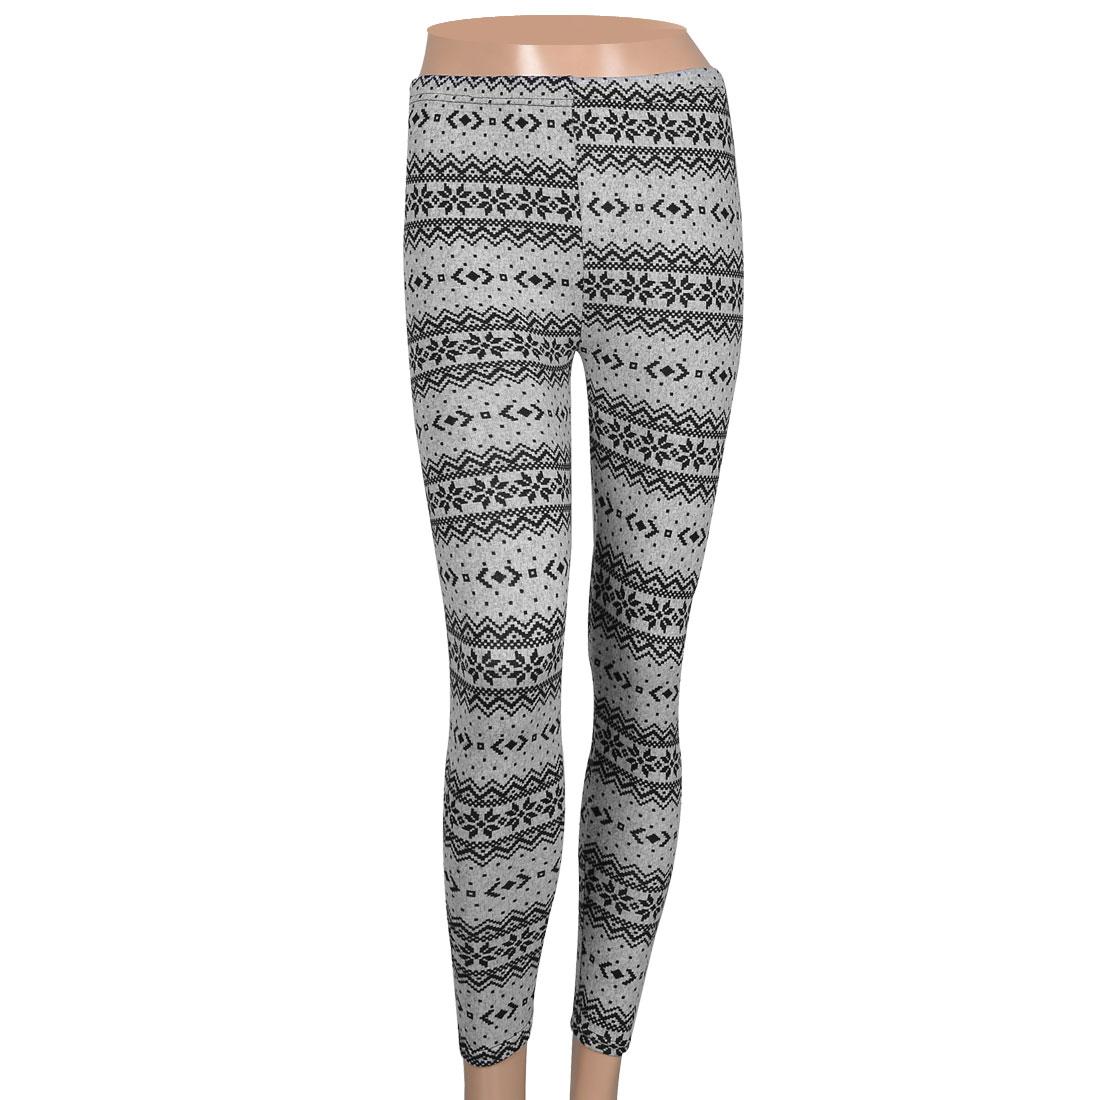 Lady Black Nordic Pattern Light Gray Winter Kniting Leggings XS